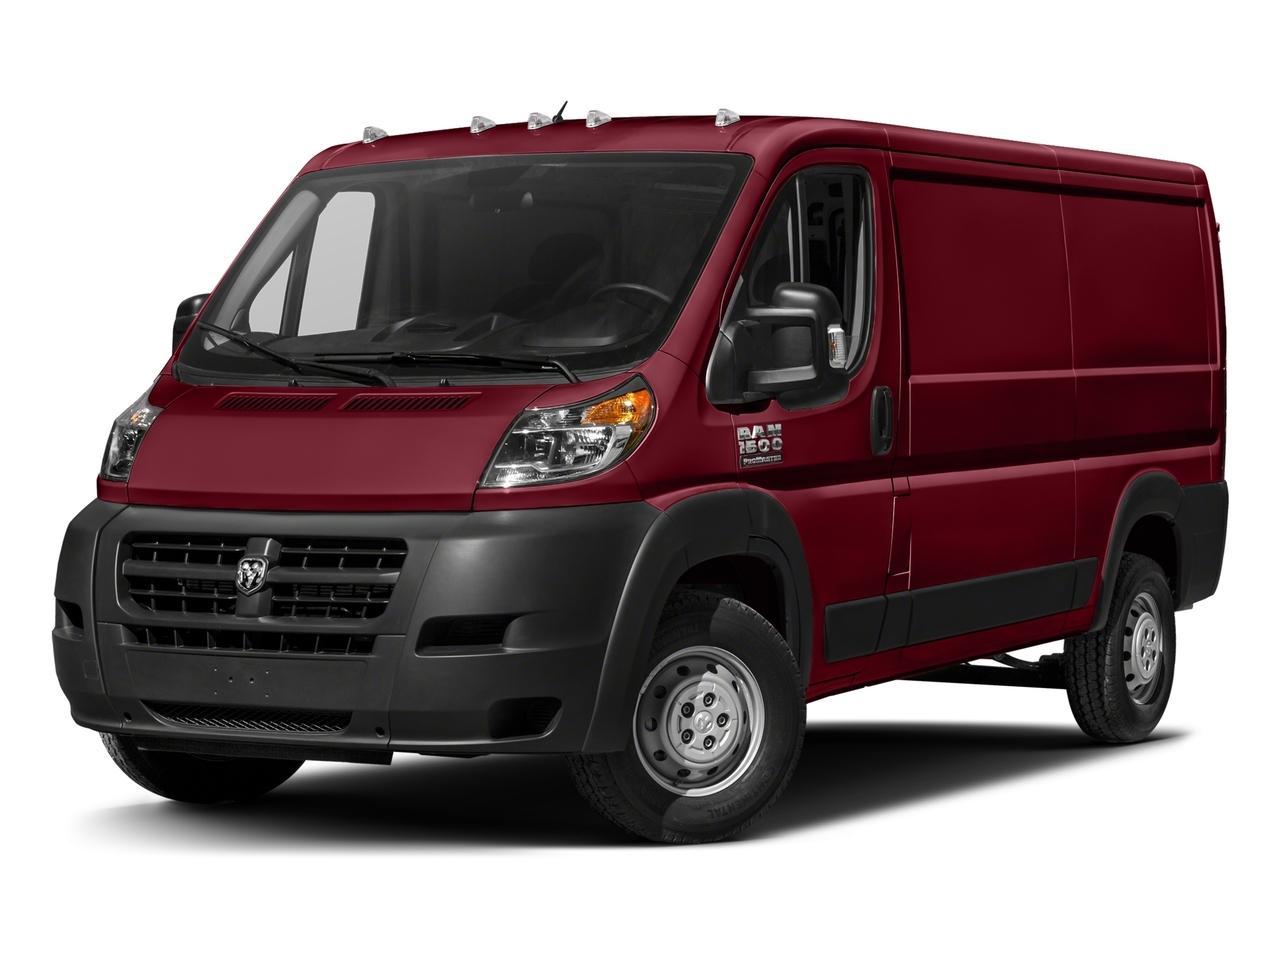 2018 Ram ProMaster Cargo Van Vehicle Photo in Joliet, IL 60586